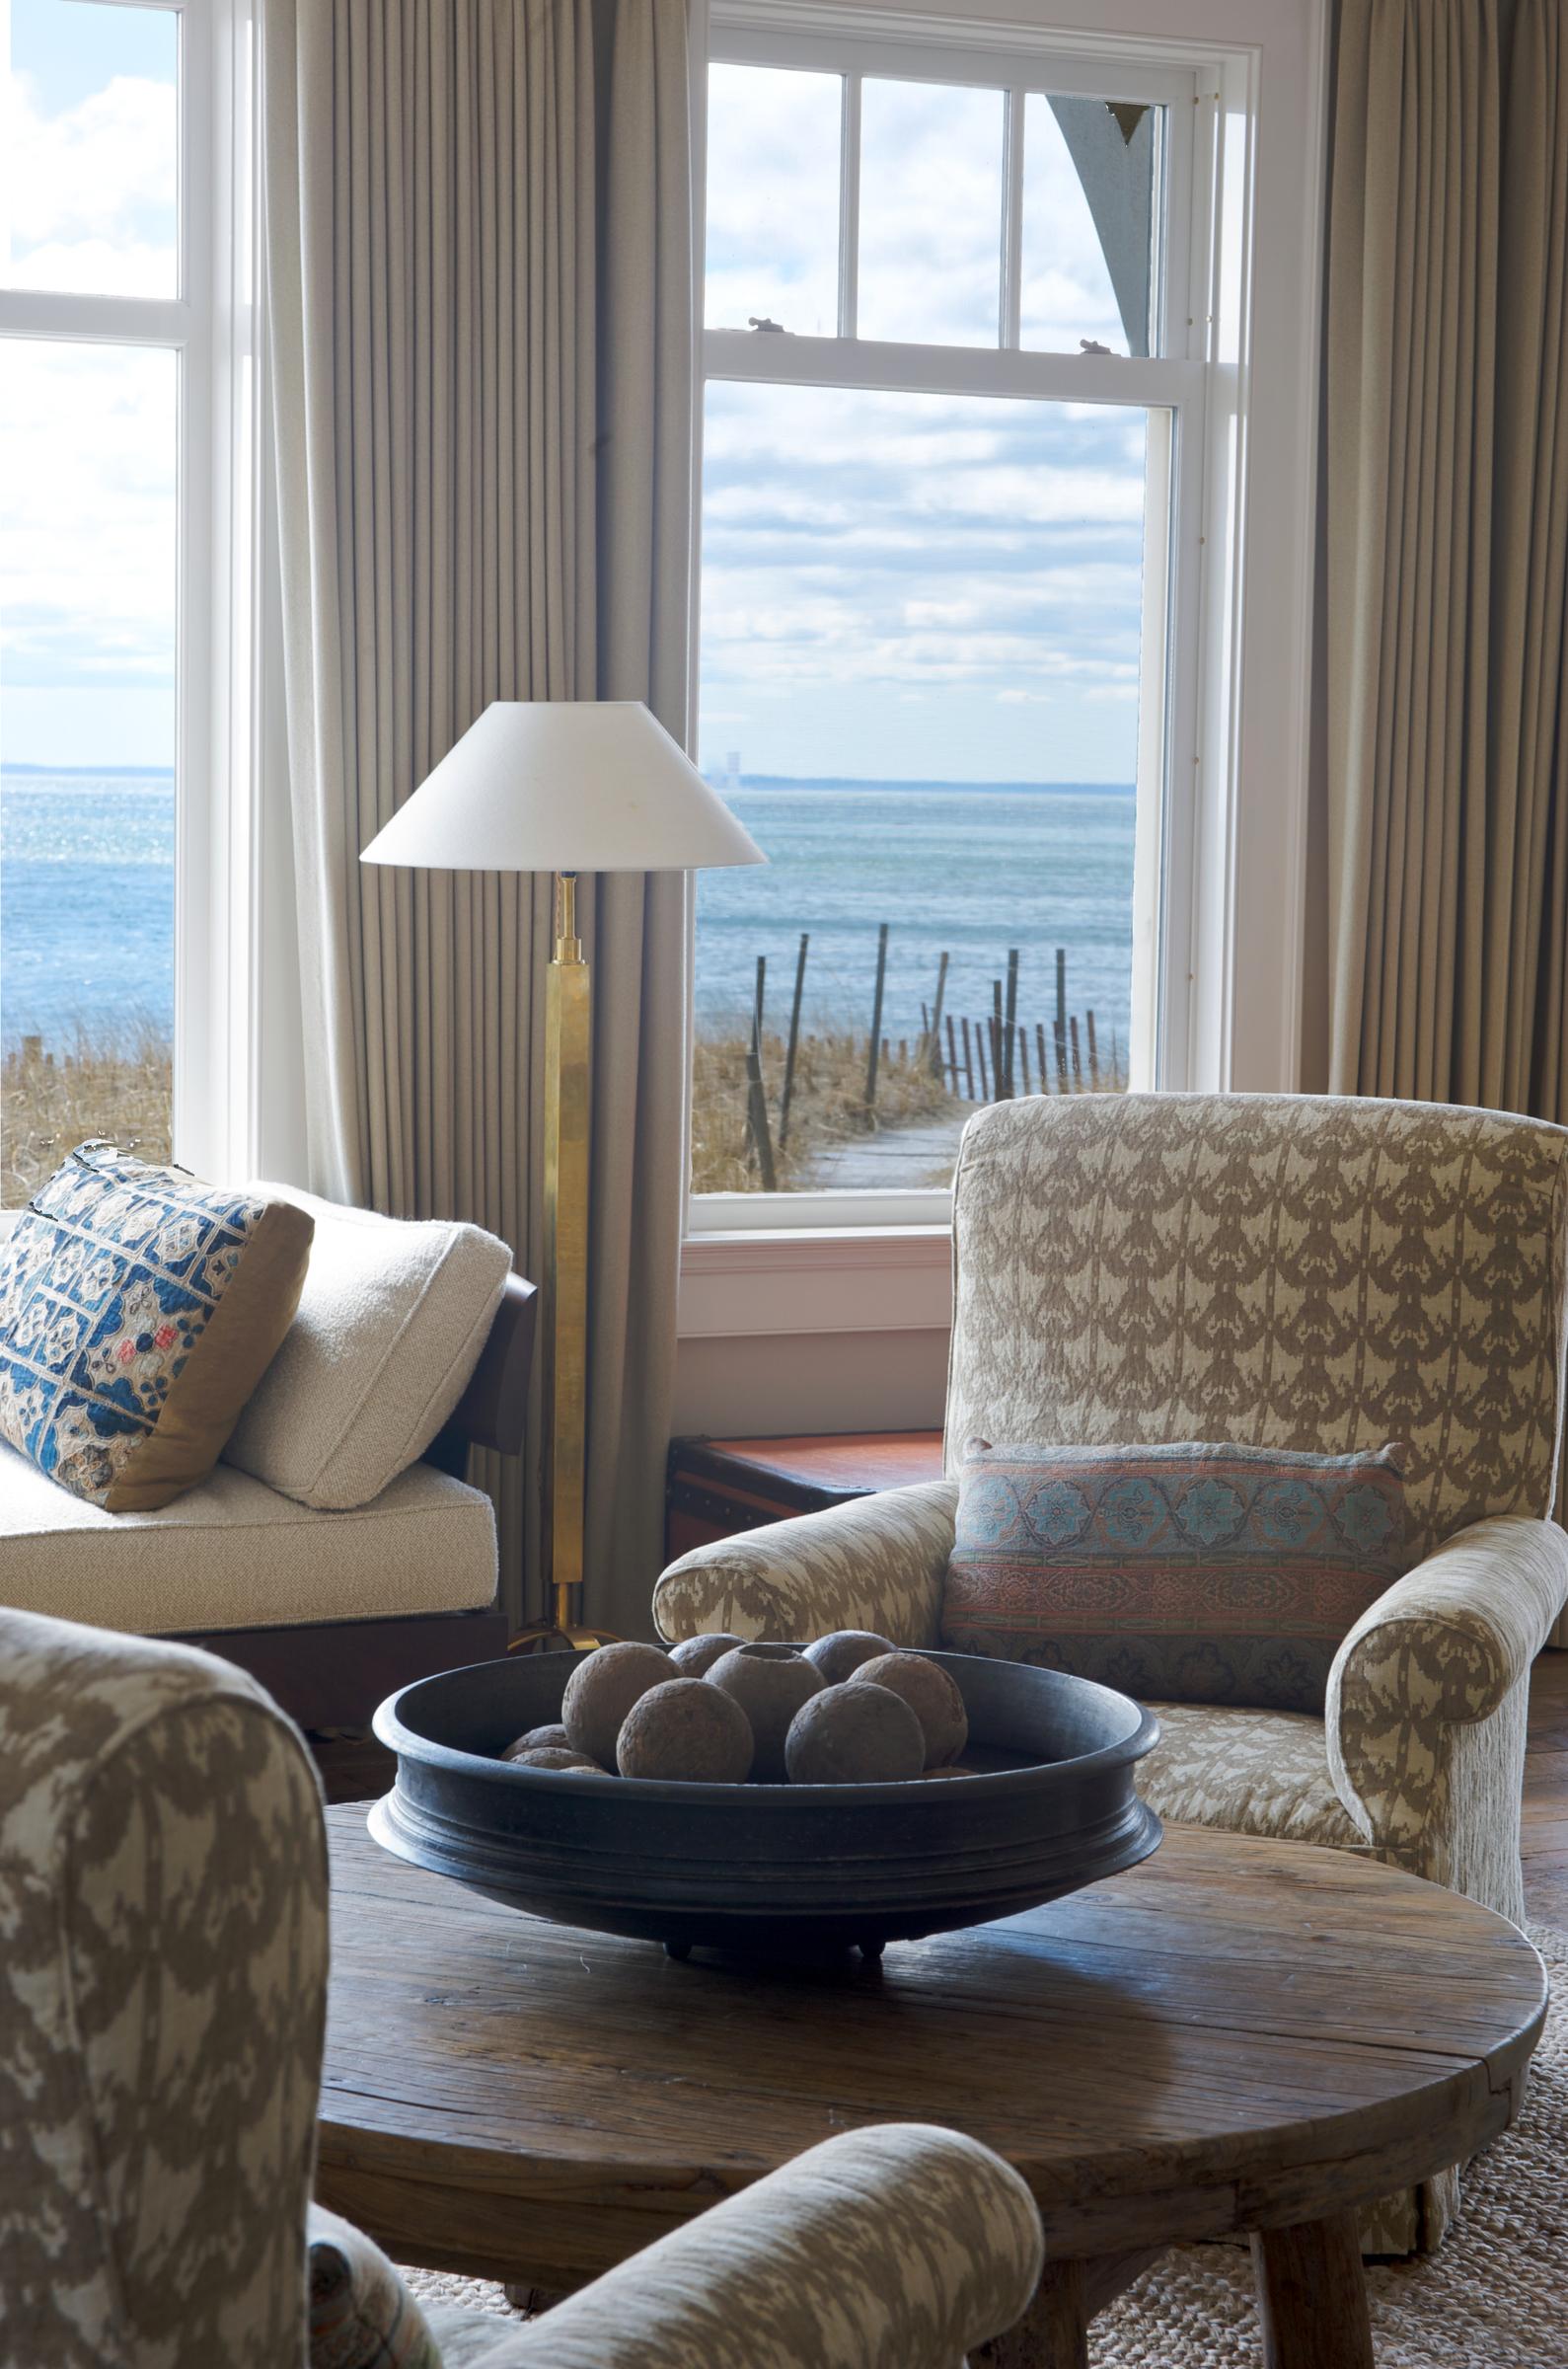 main room seating with window view.jpg